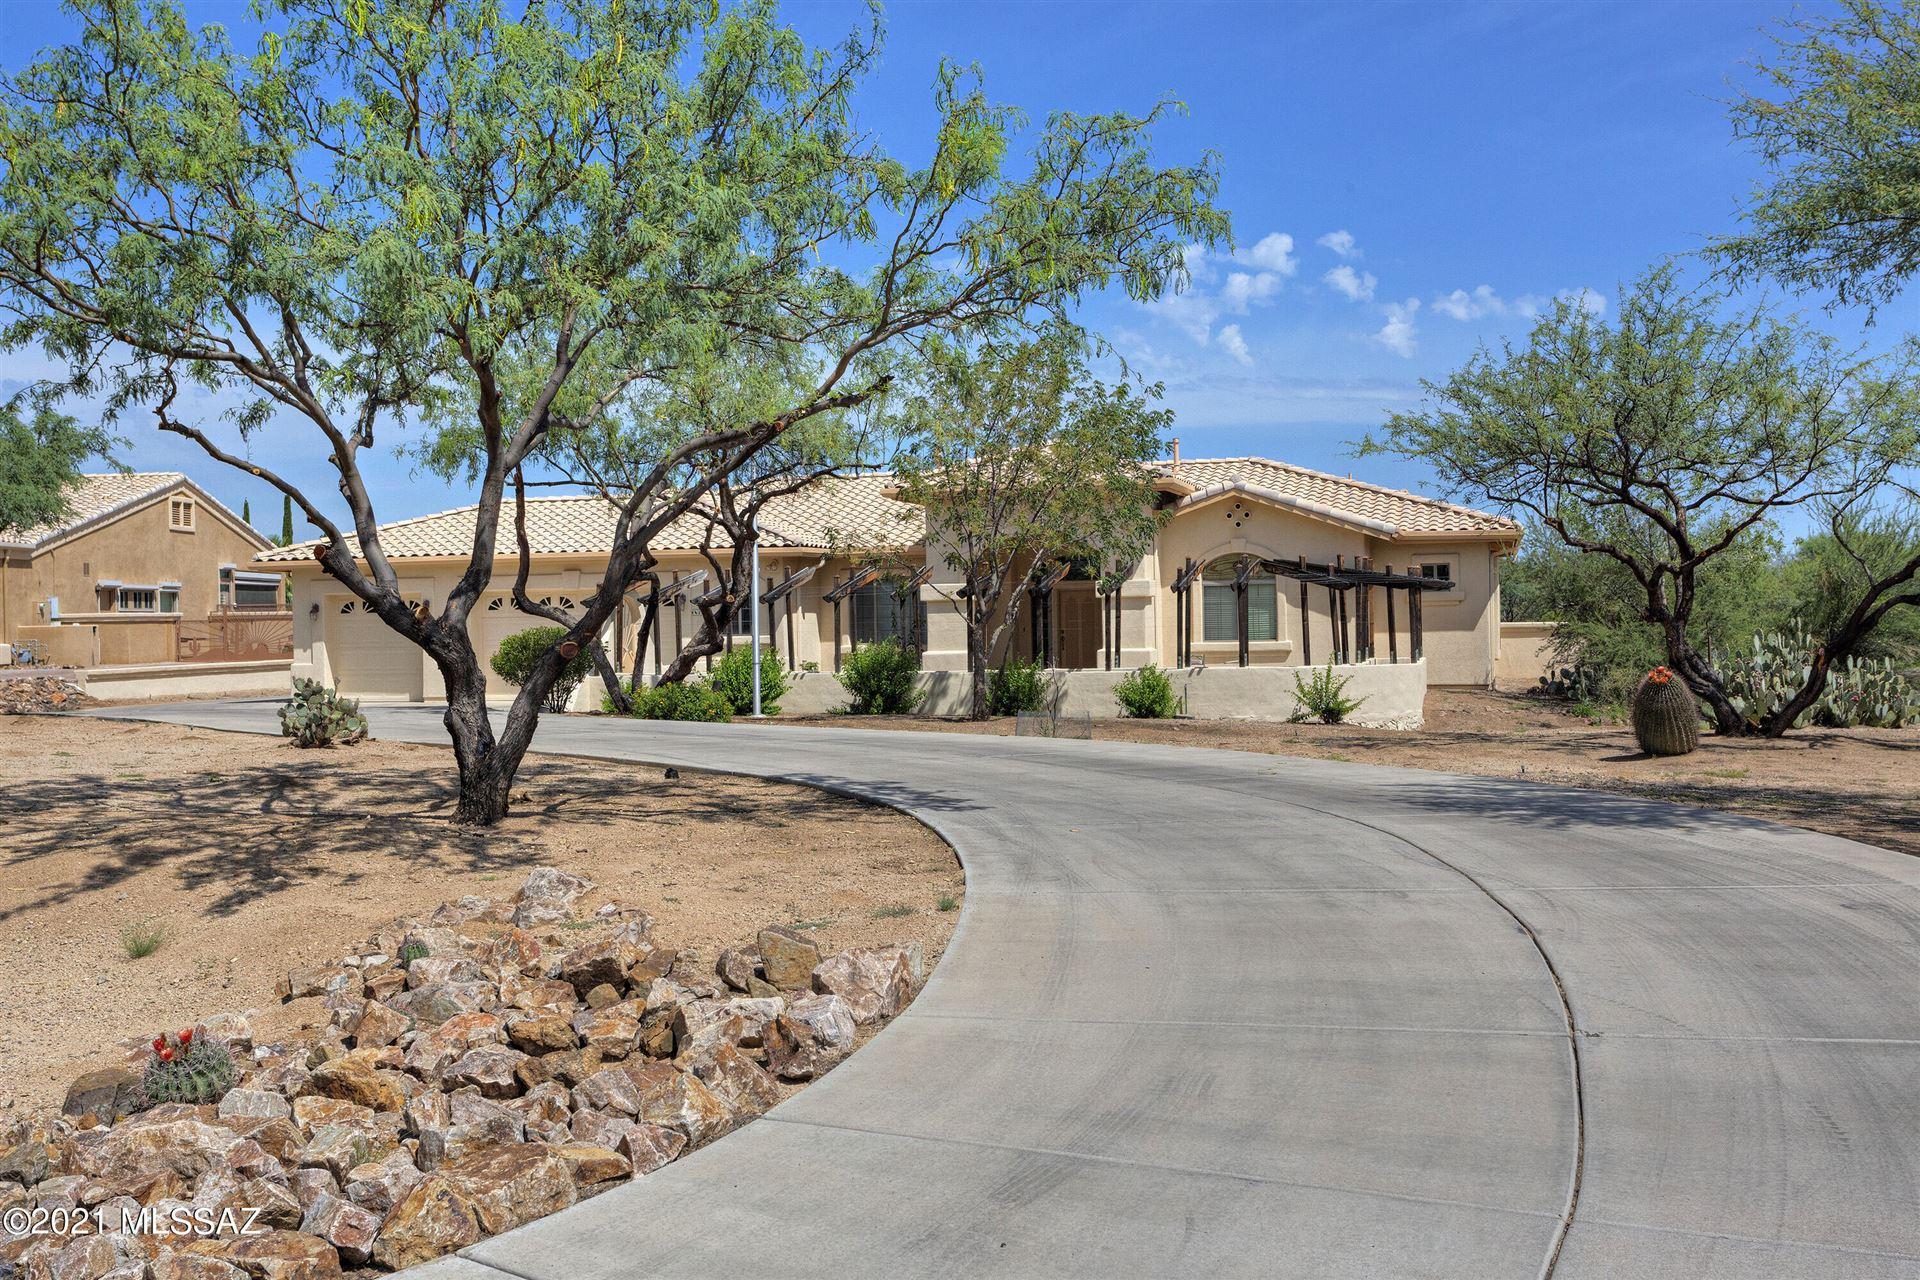 1258 W Bosque Drive, Sahuarita, AZ 85629 - MLS#: 22123208